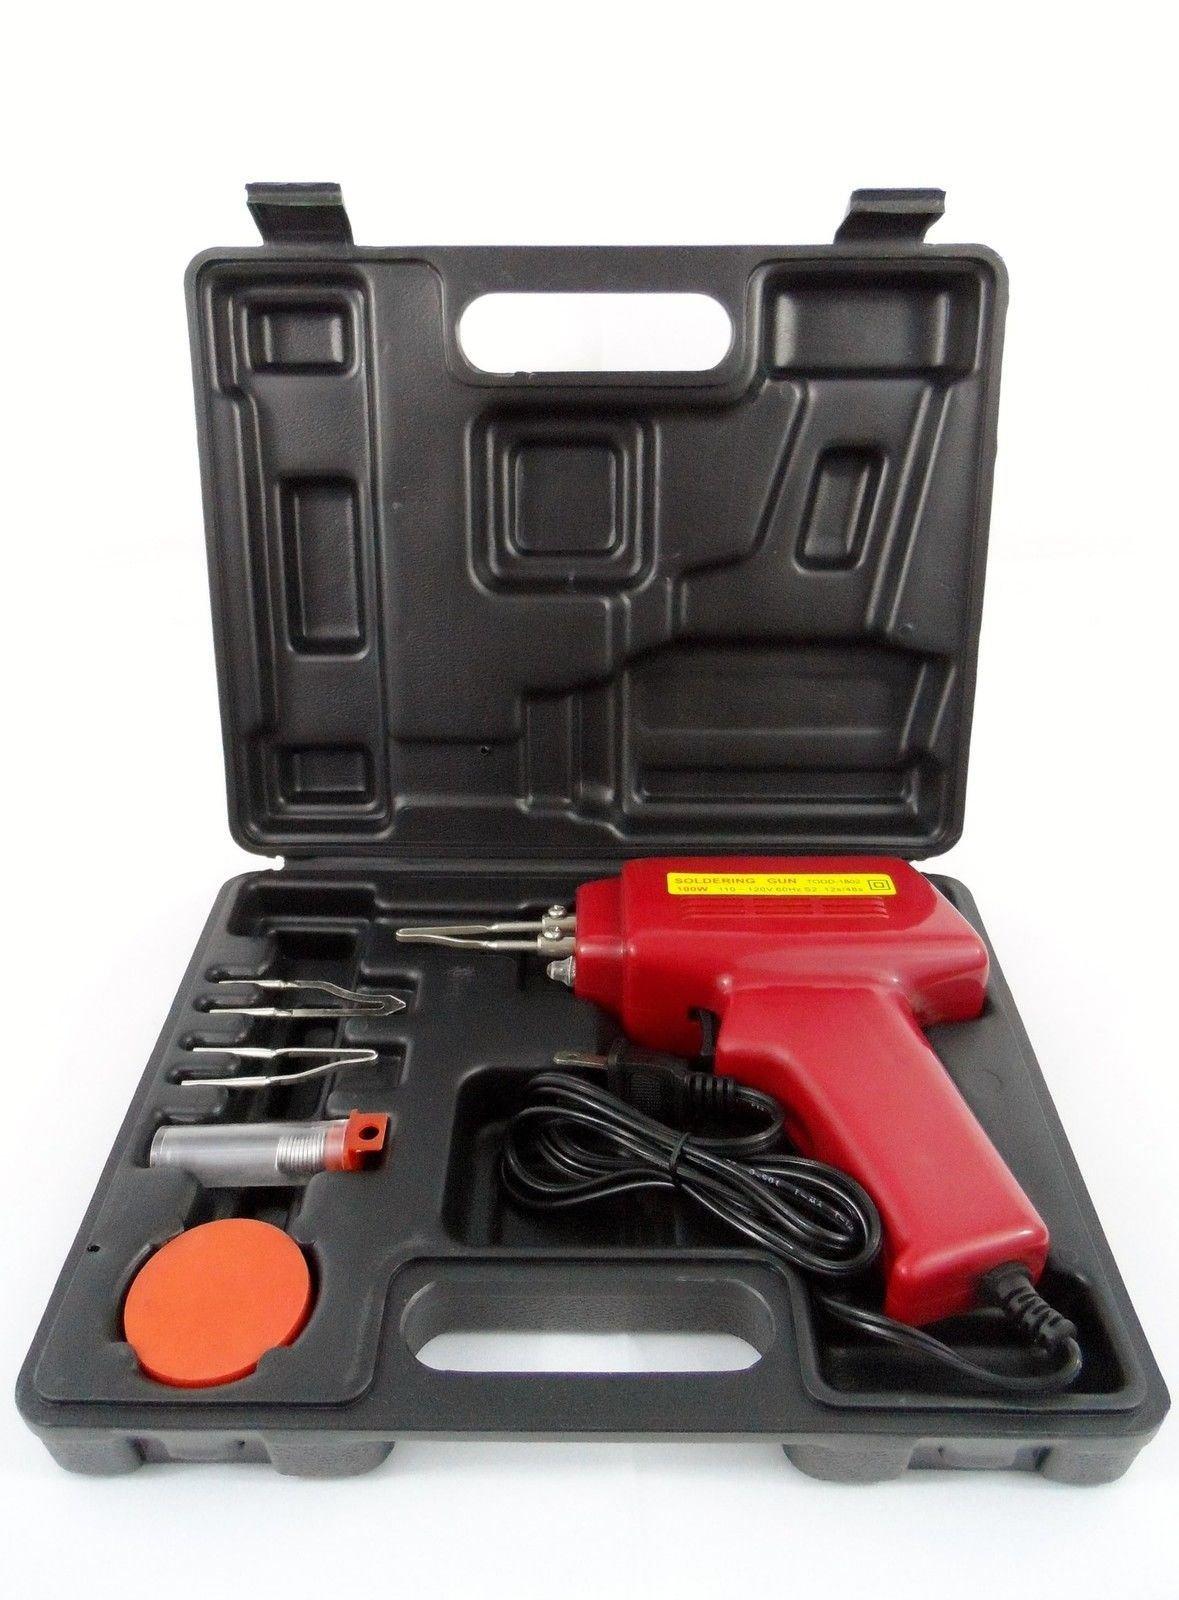 New 5pc 100w Soldering Gun Kit W/case Iron Solder Professional Style Sodering